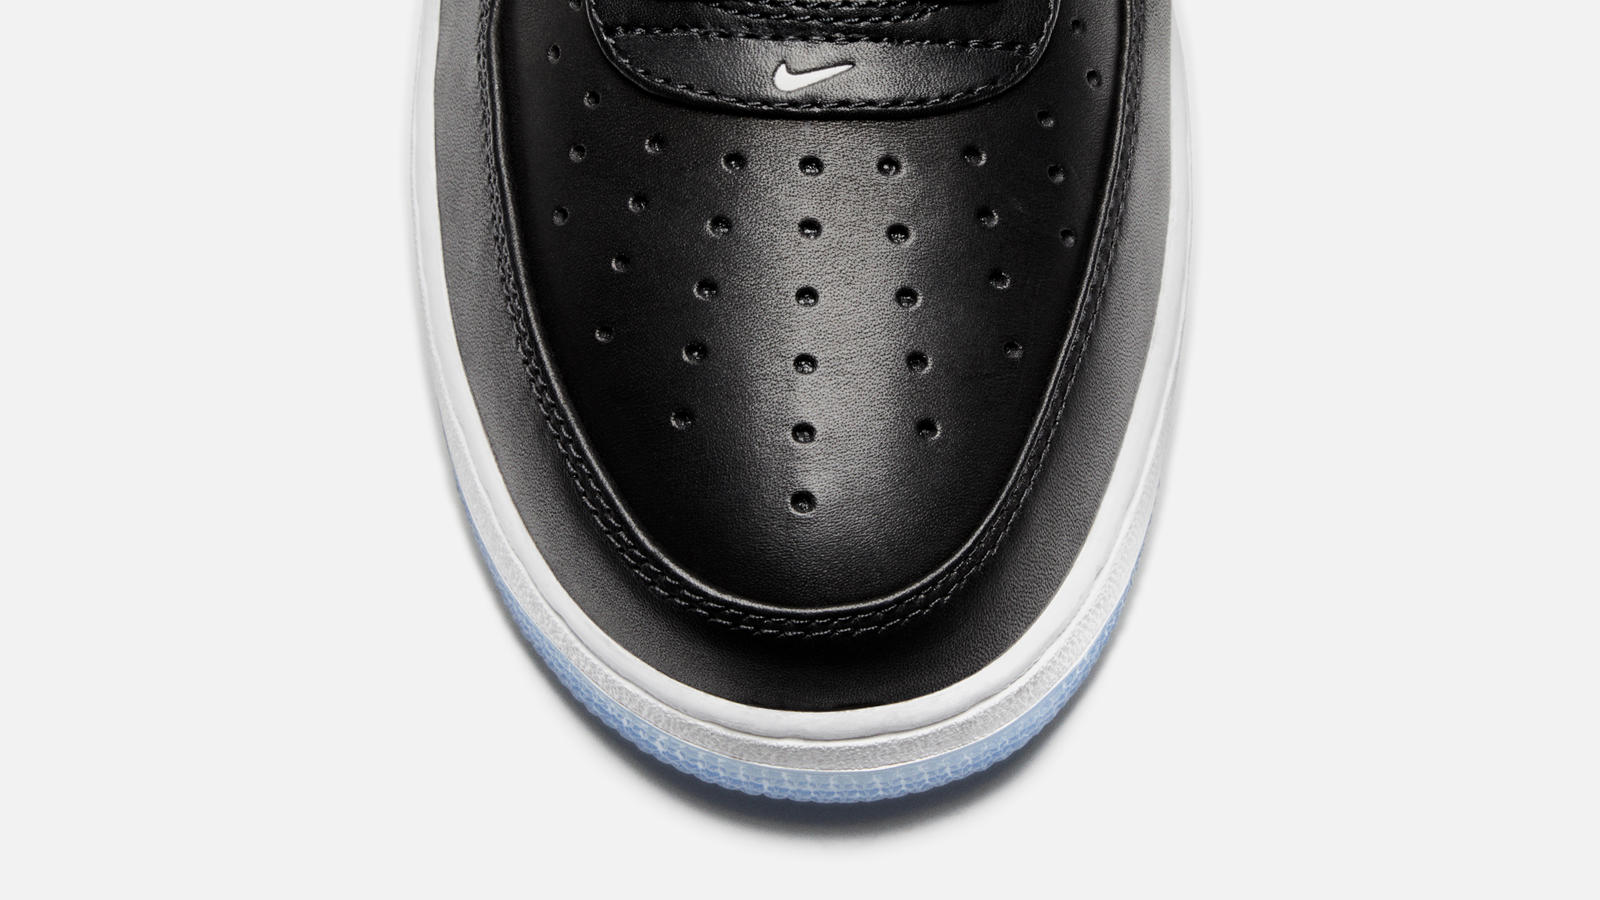 Nike Air Force 1 x Colin Kaepernick 2